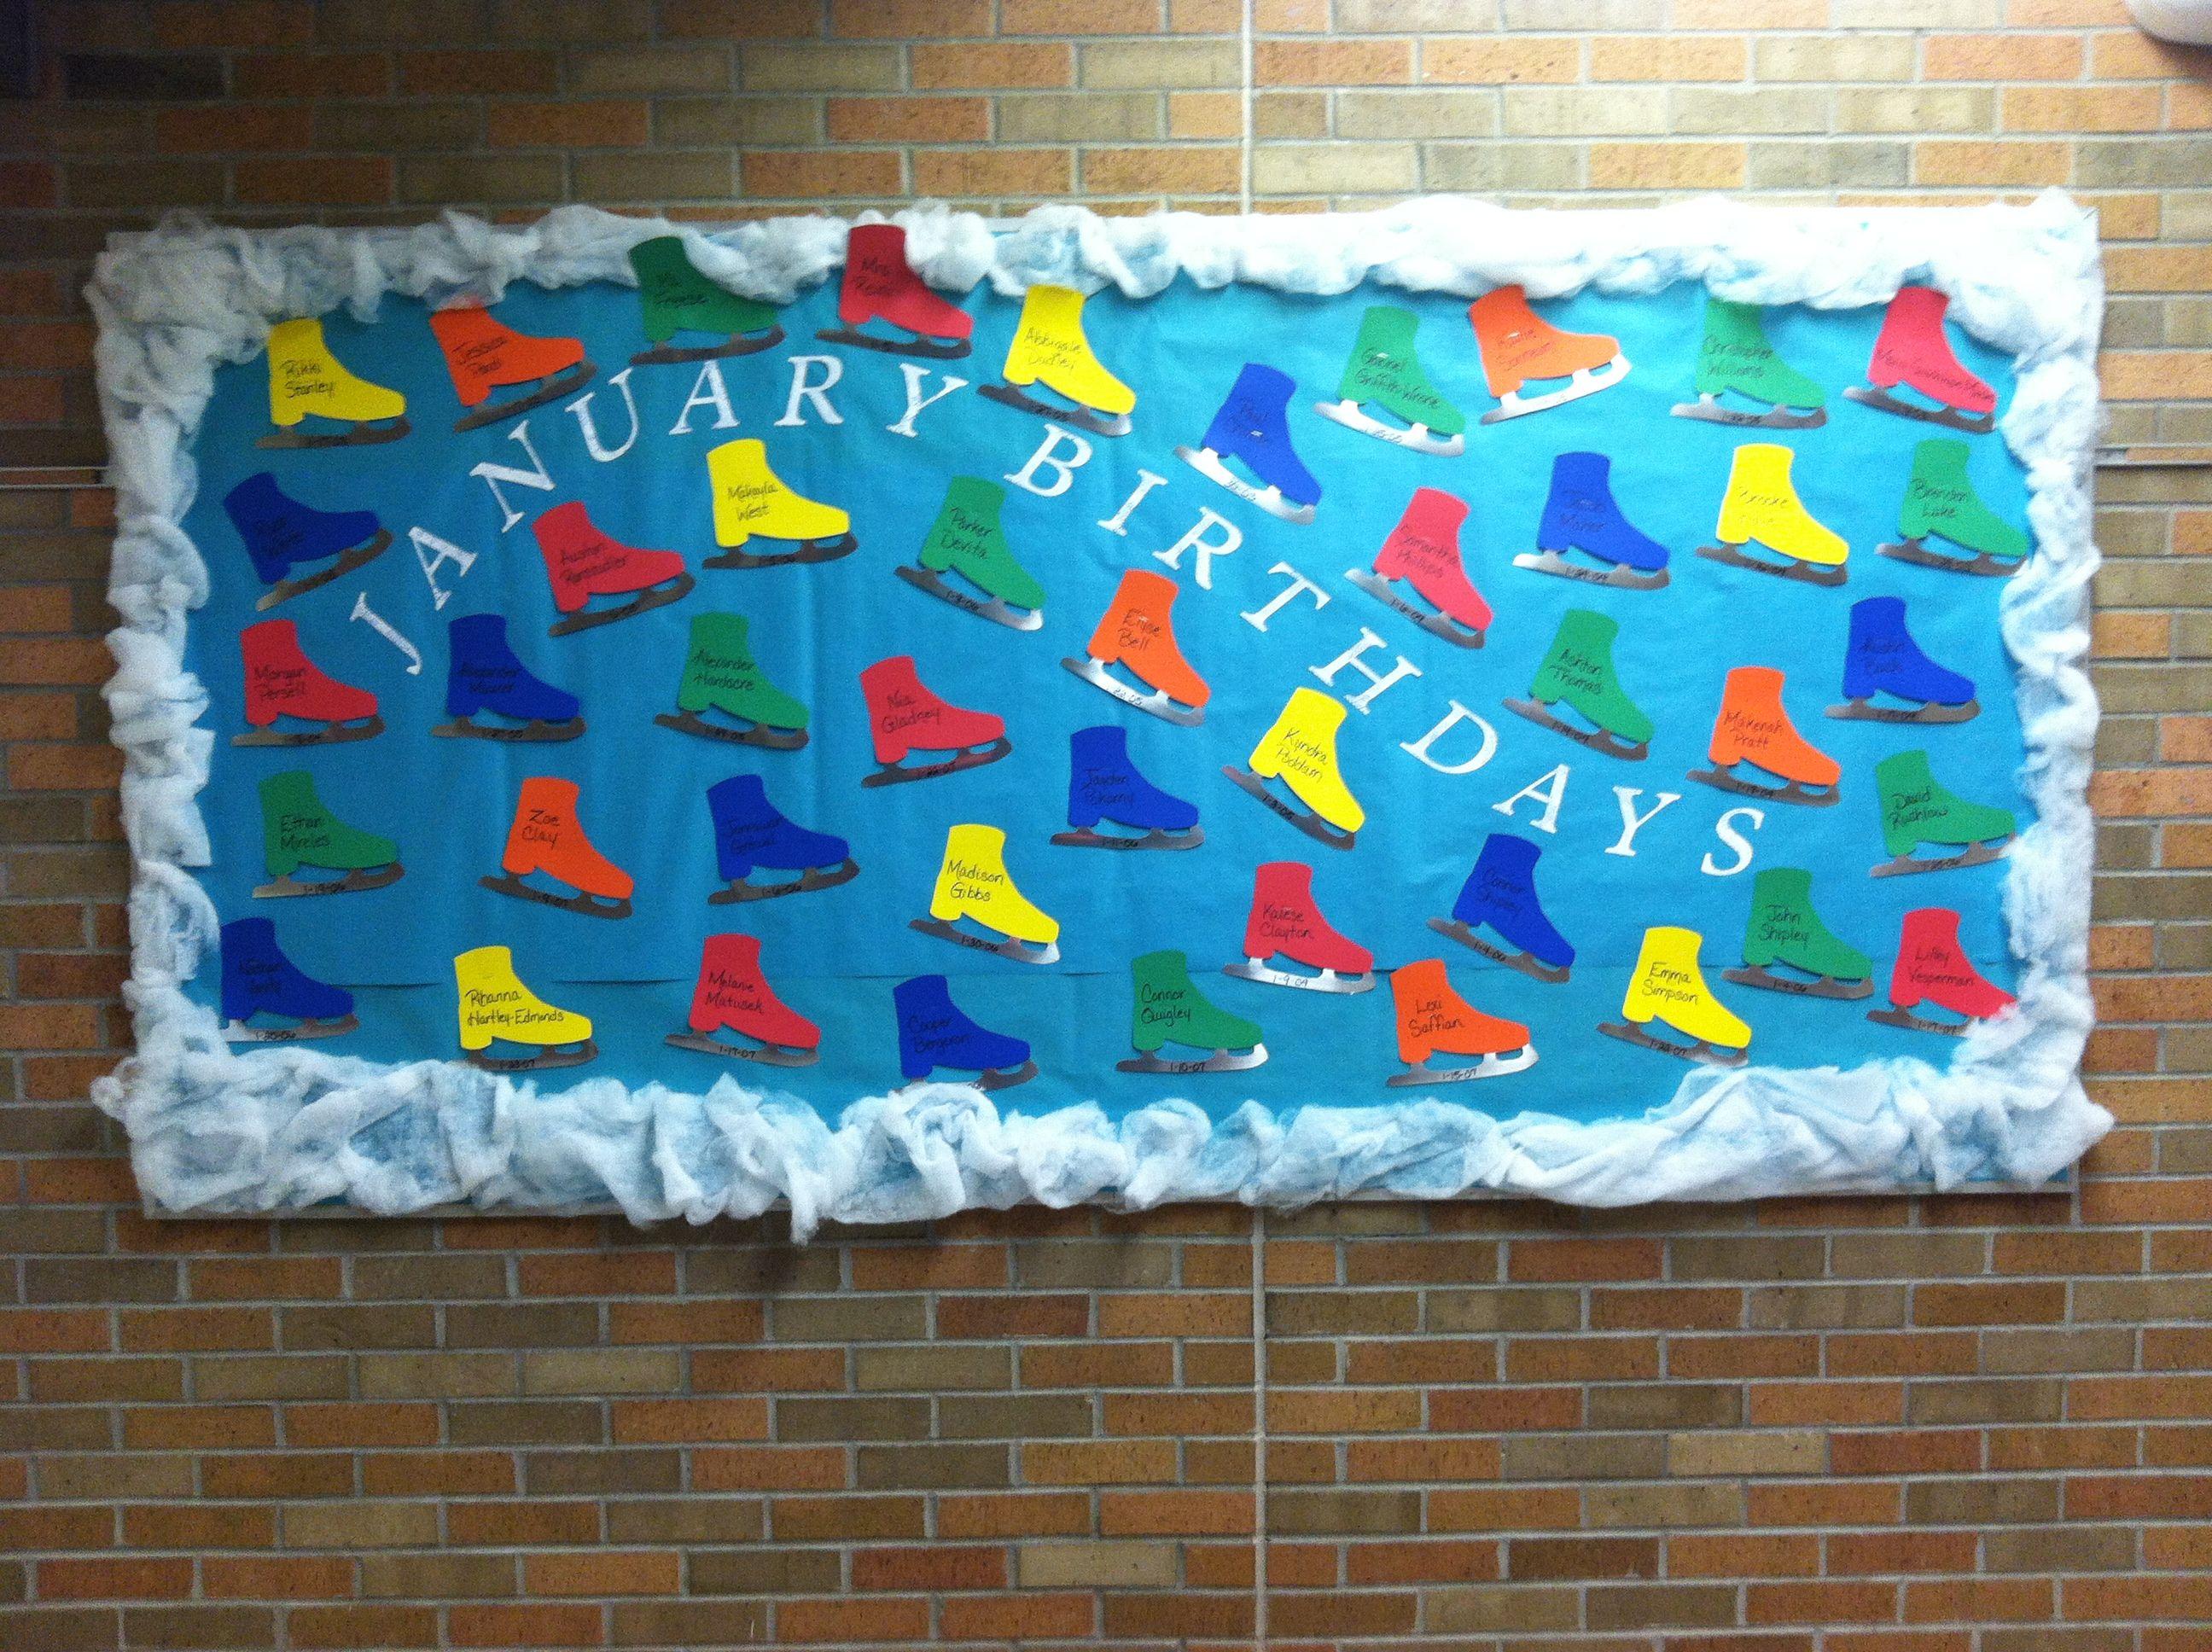 Classroom Bulletin Board Ideas For January : Cute ice skates for january s birthday bulletin board